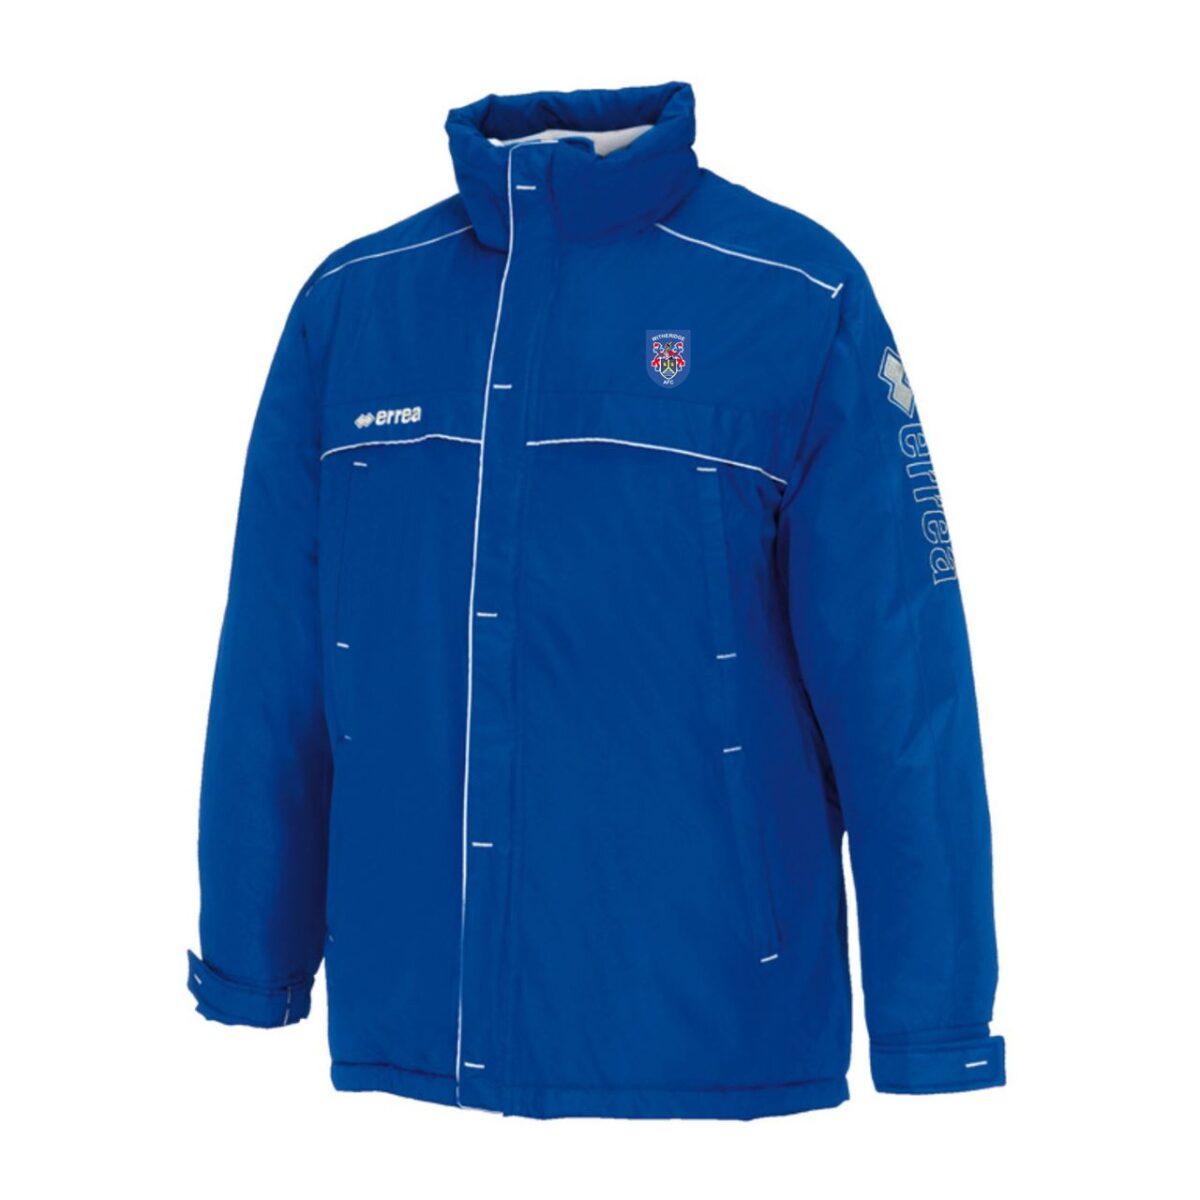 Witheridge Football Club Winter Coat - Royal